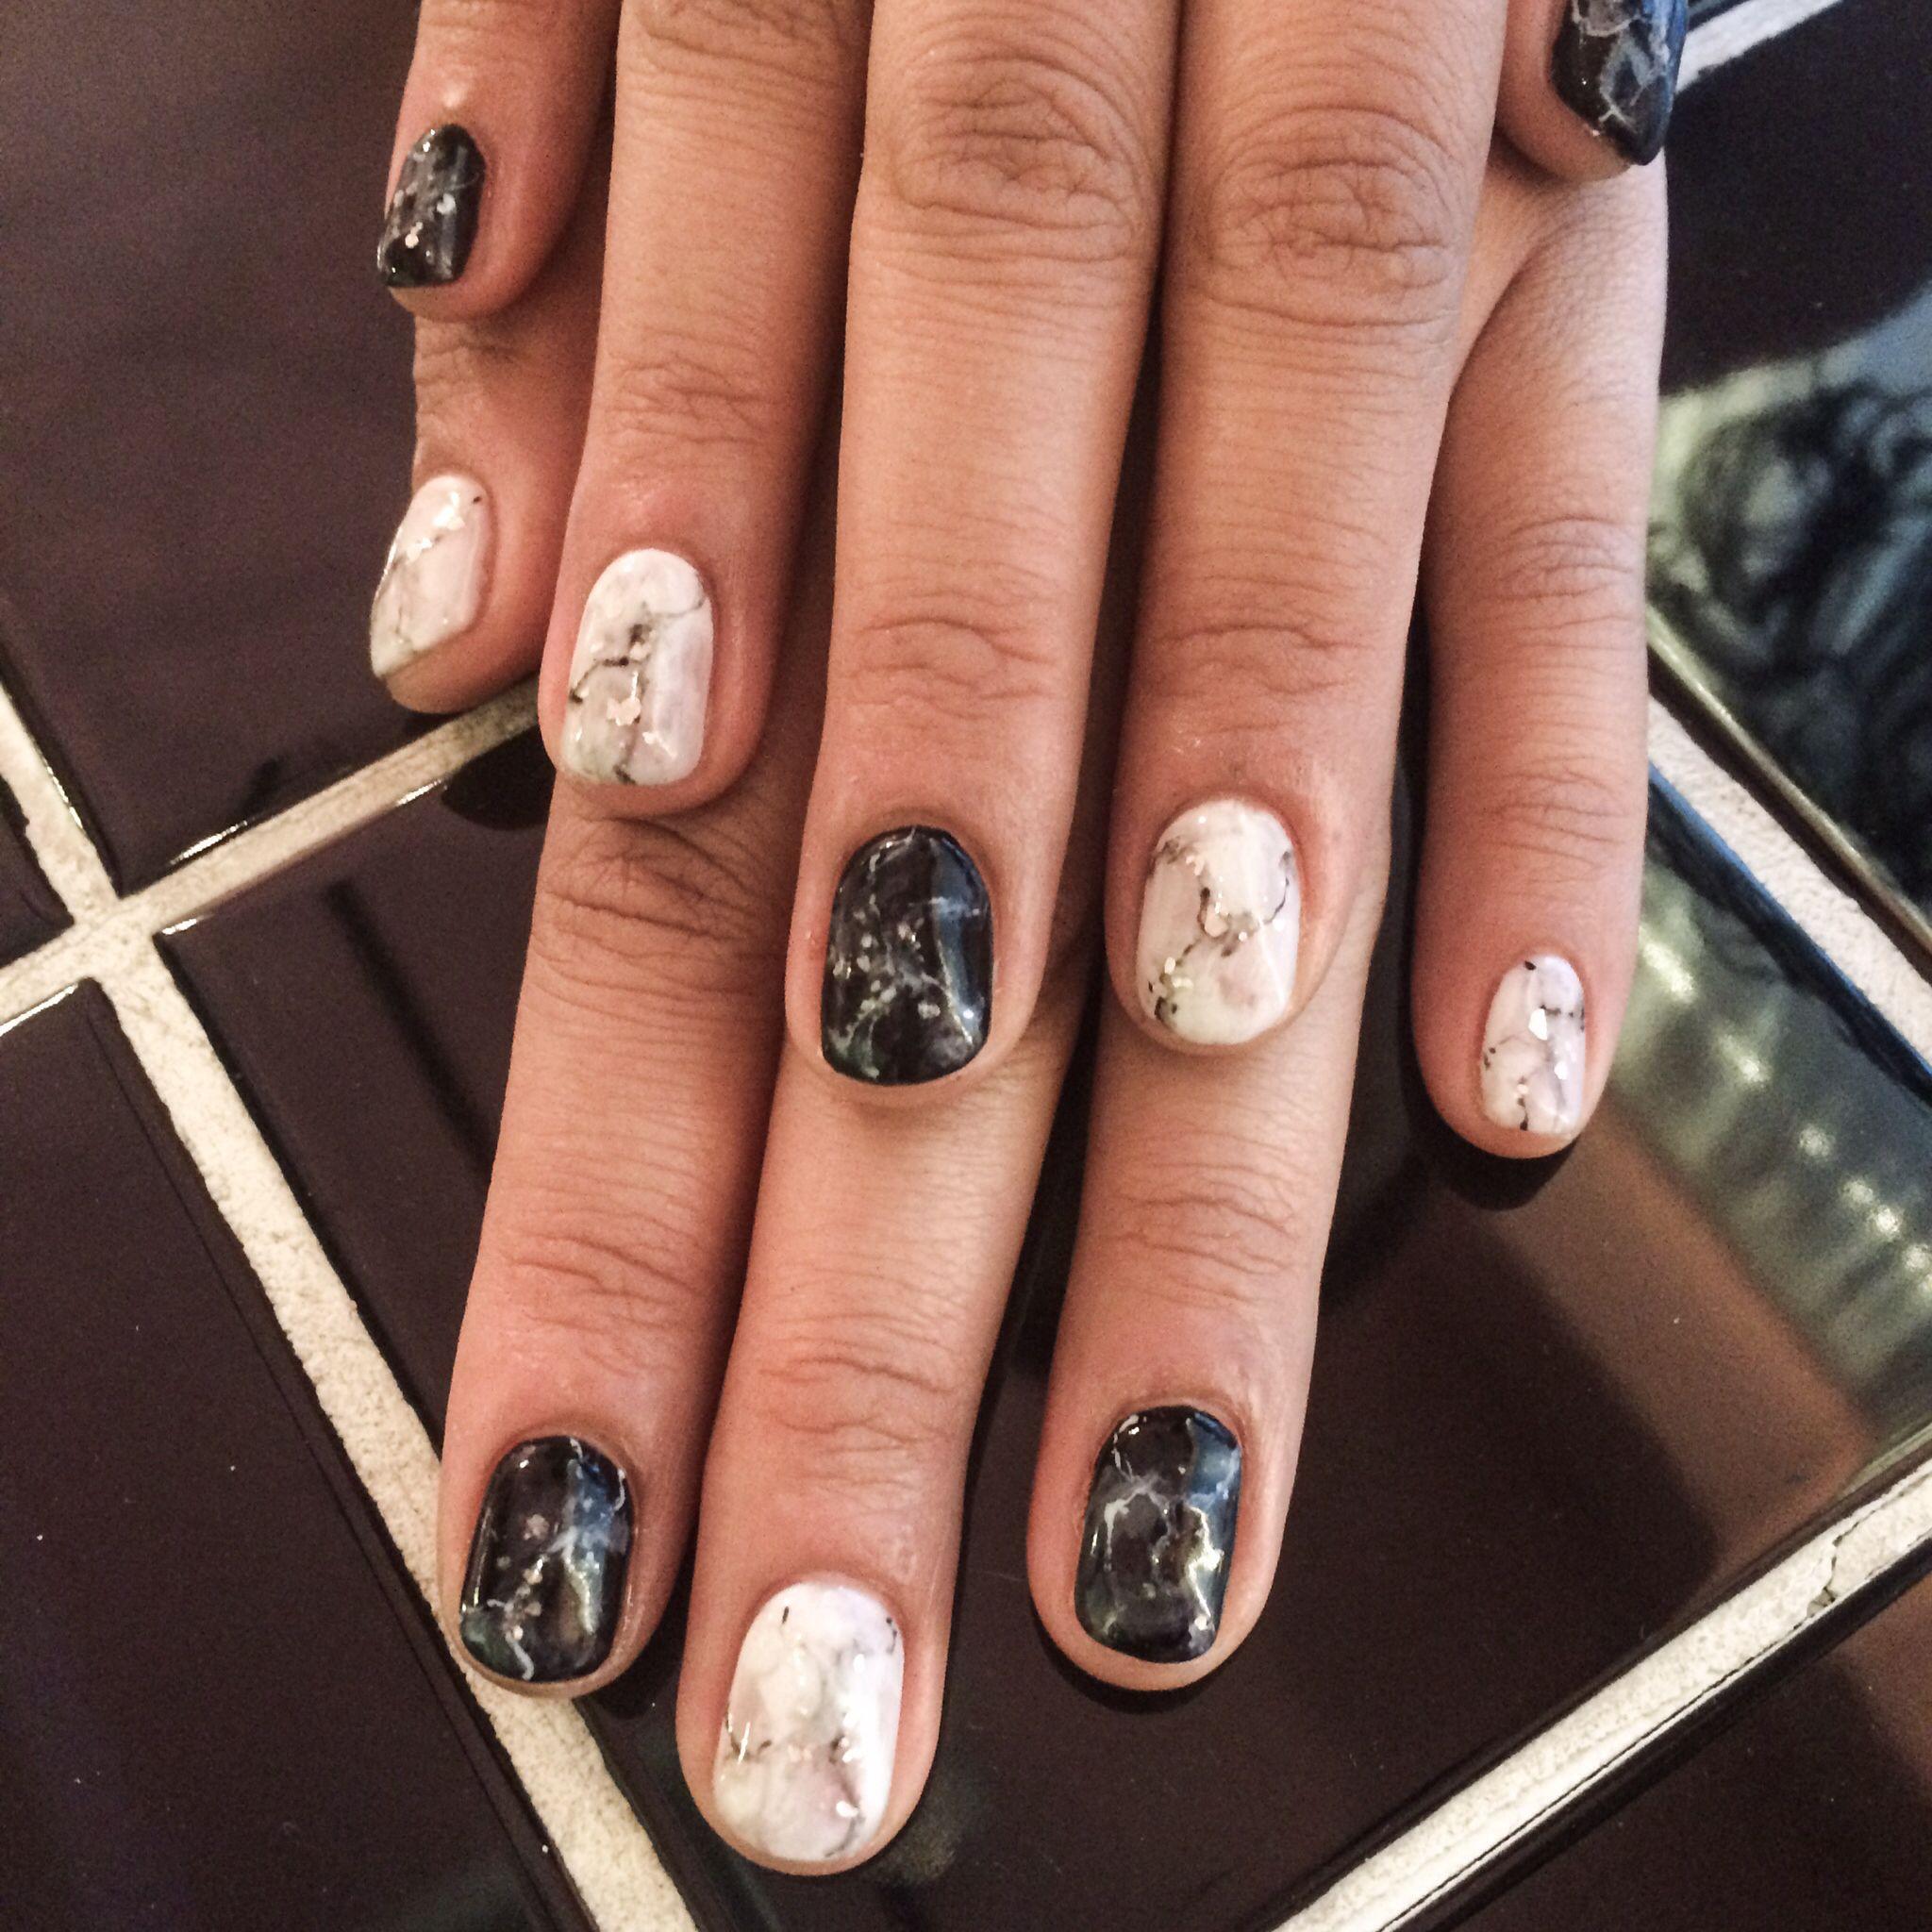 Gel marble nail art done by Disco Nails in Shibuya Tokyo | Nails ...